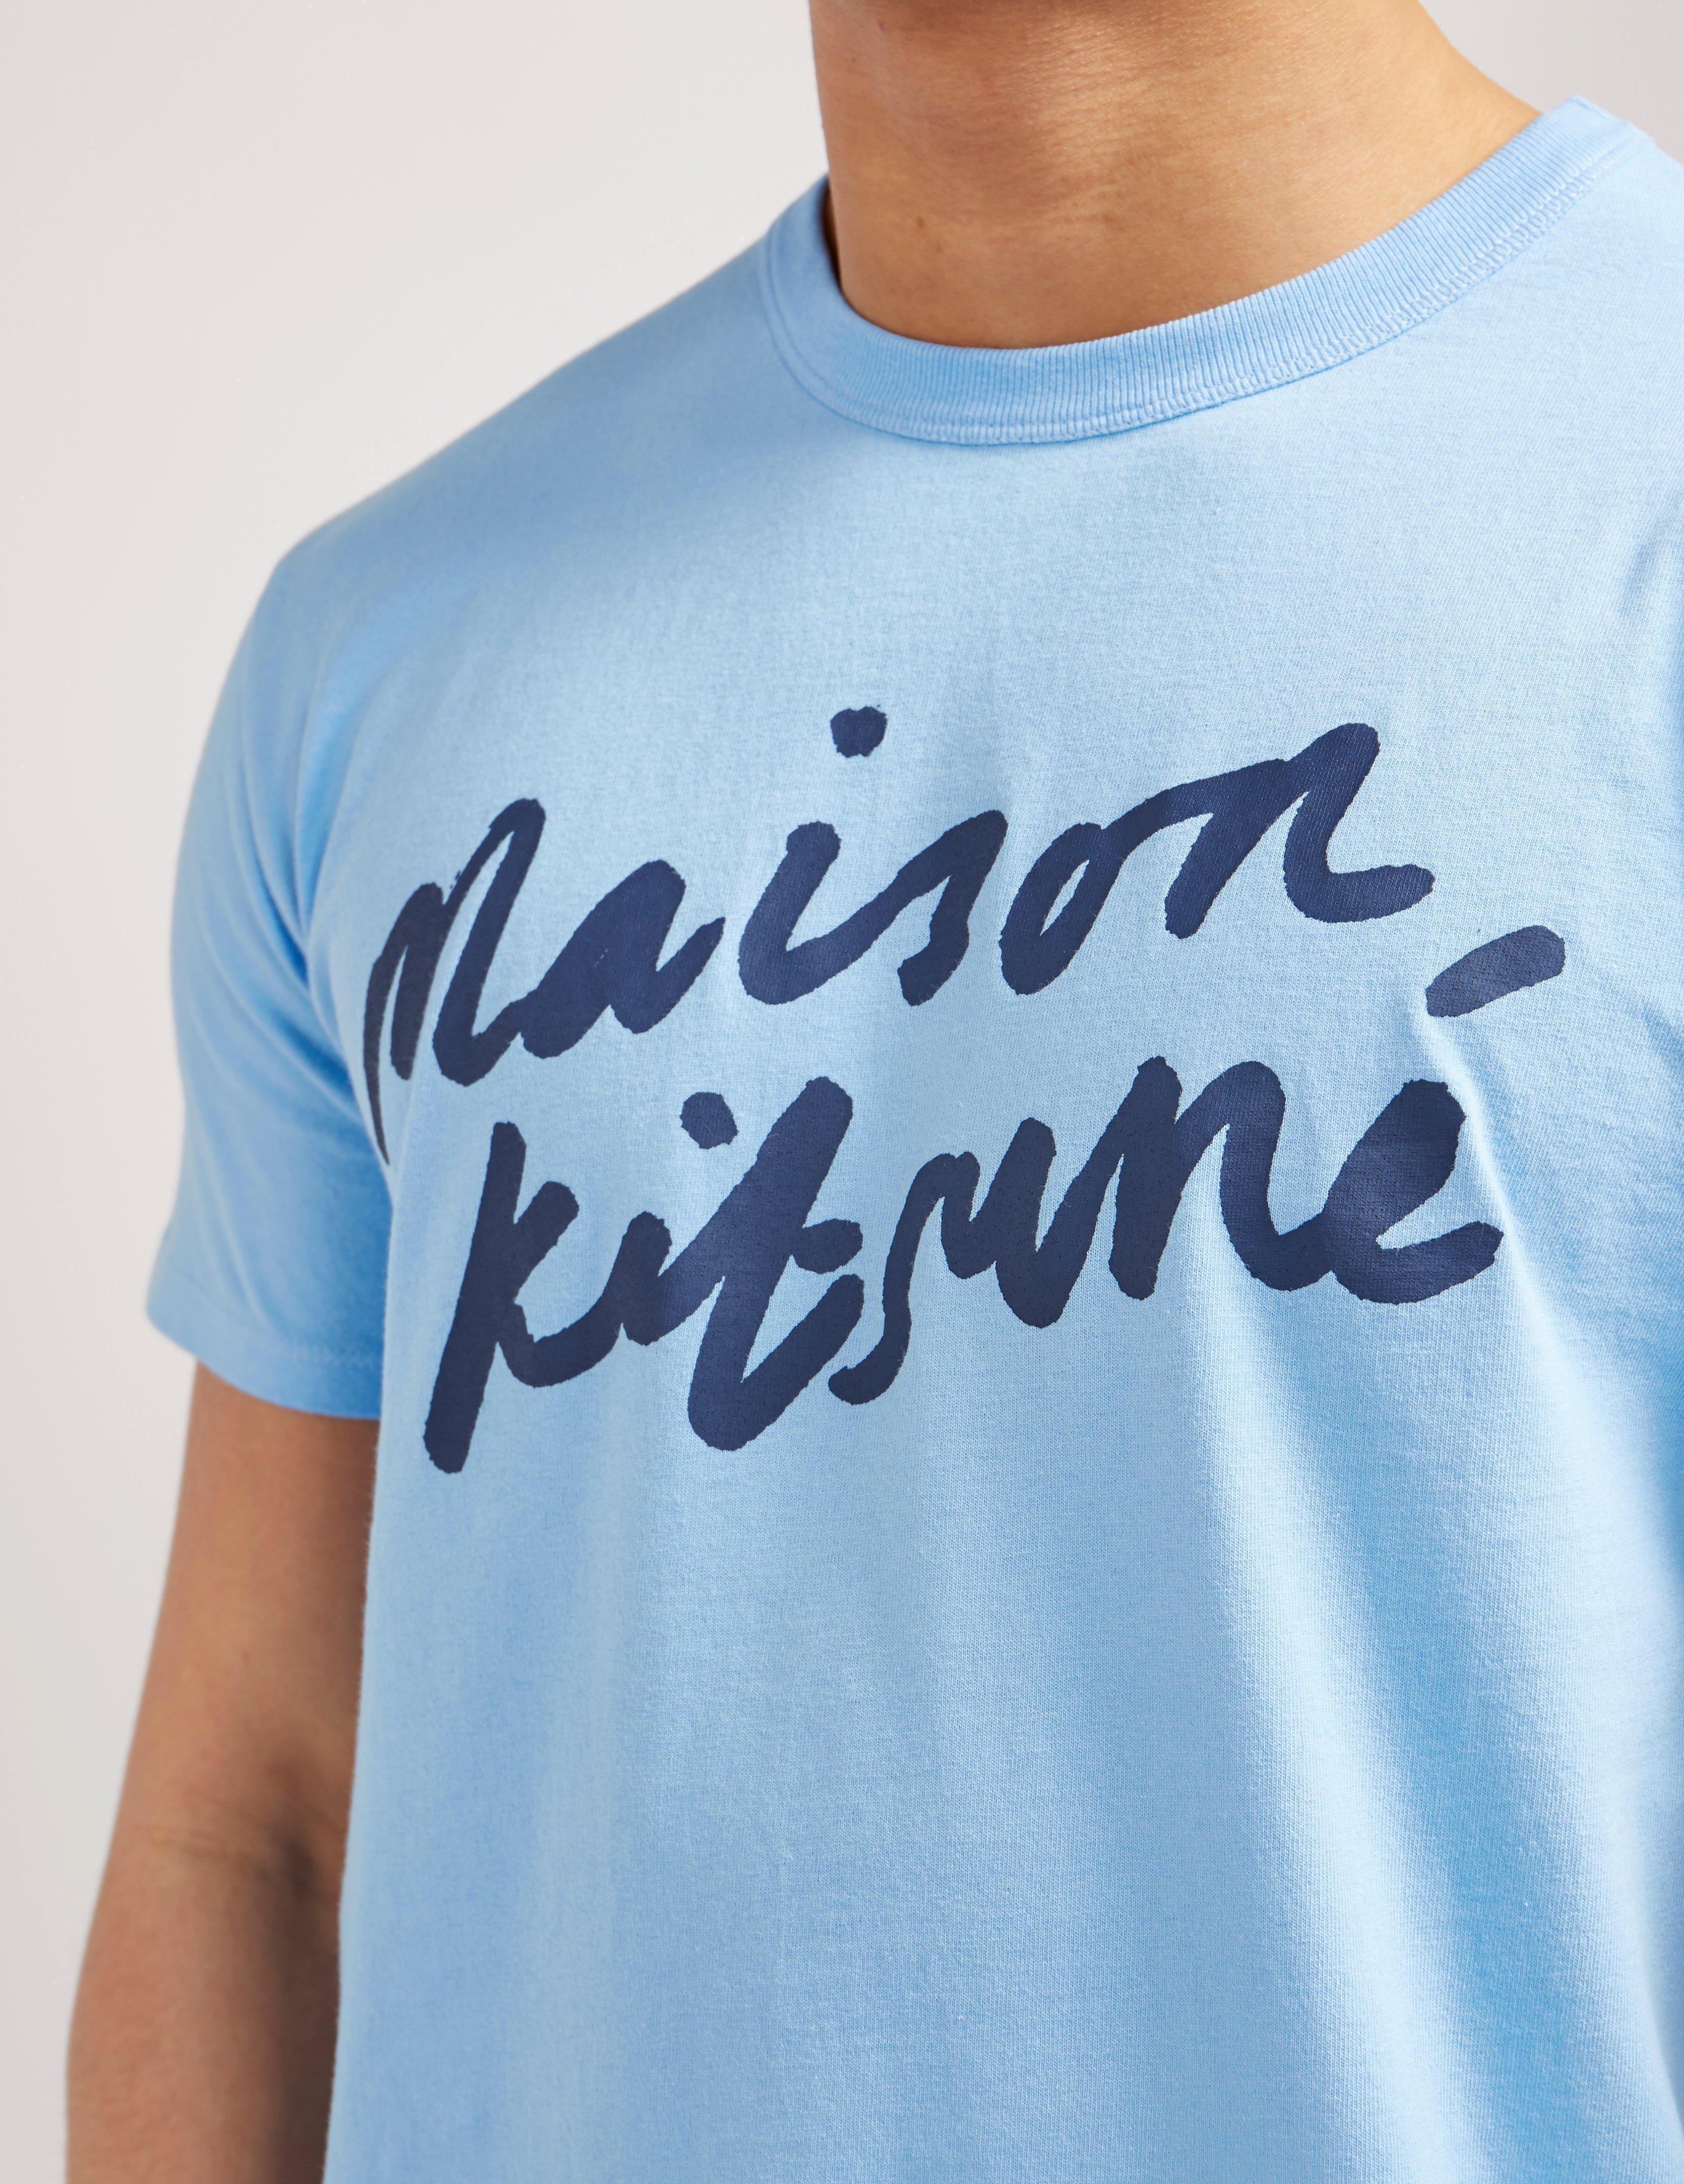 41b8b2af2689 Lyst - Maison Kitsuné Handwriting Short Sleeve T-shirt in Blue for Men